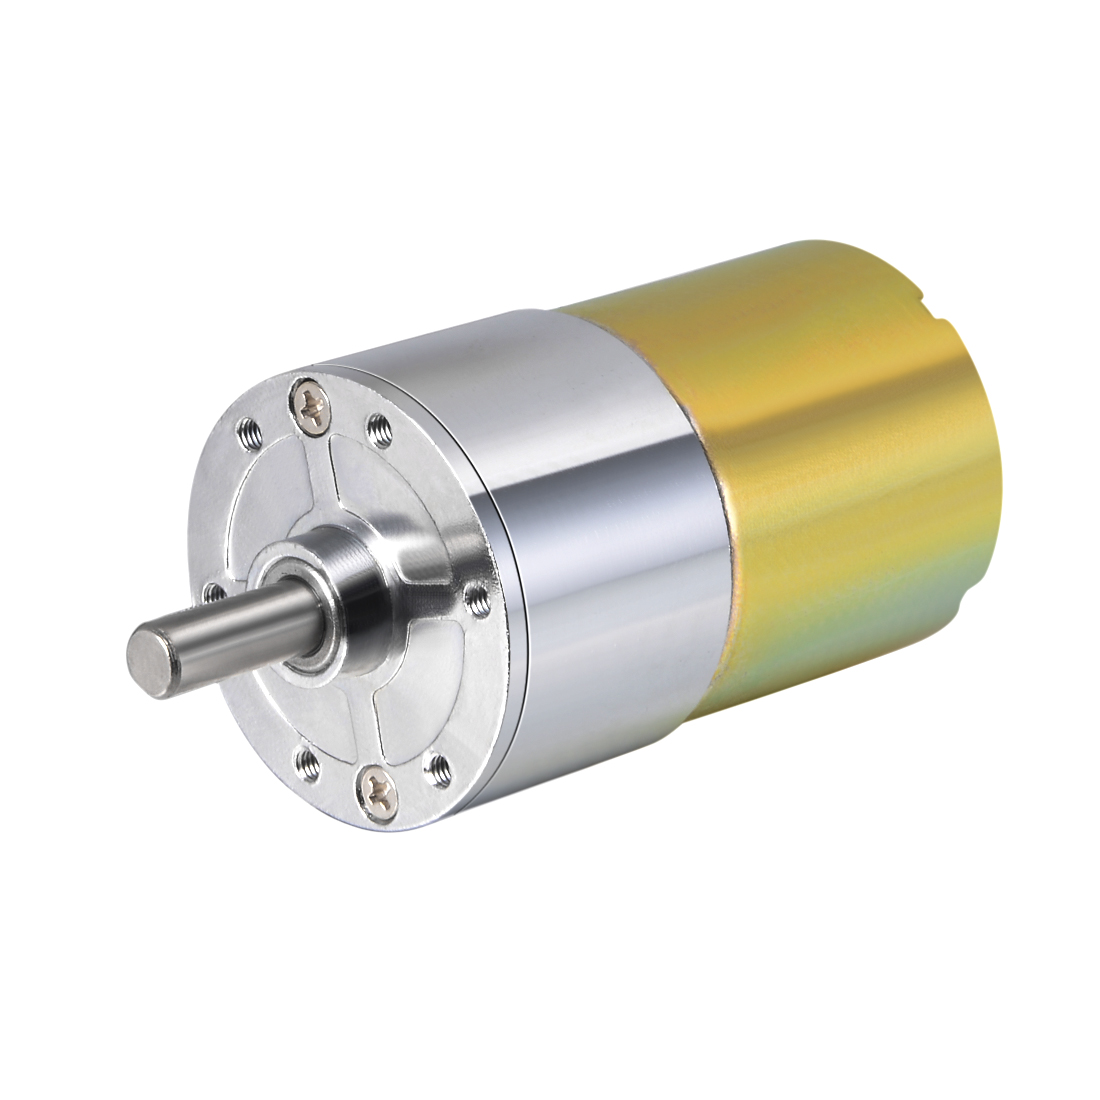 24V DC 100 RPM Gear Motor High Torque Reduction Gearbox Centric Output Shaft